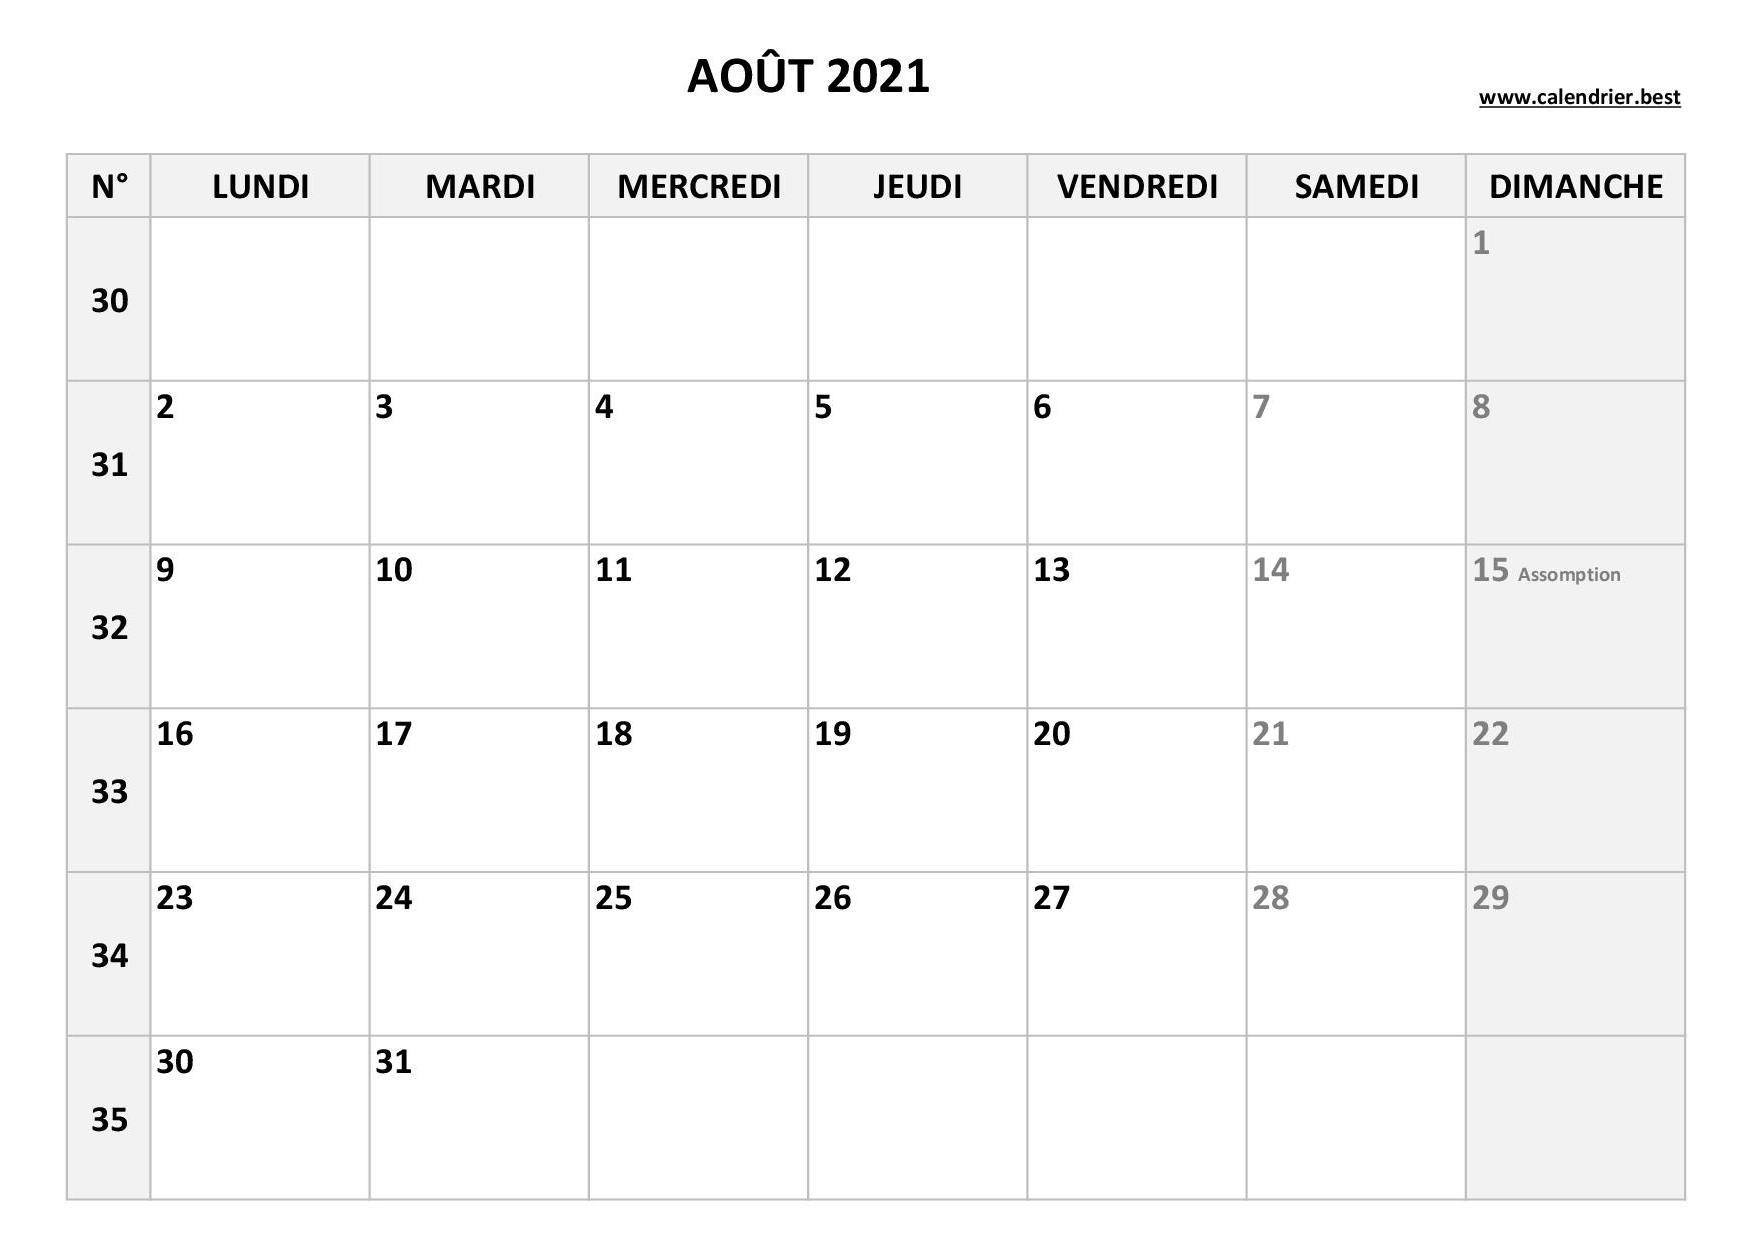 Calendrier Du Mois Daoût 2022 Calendrier Août 2021 à consulter ou imprimer  Calendrier.best